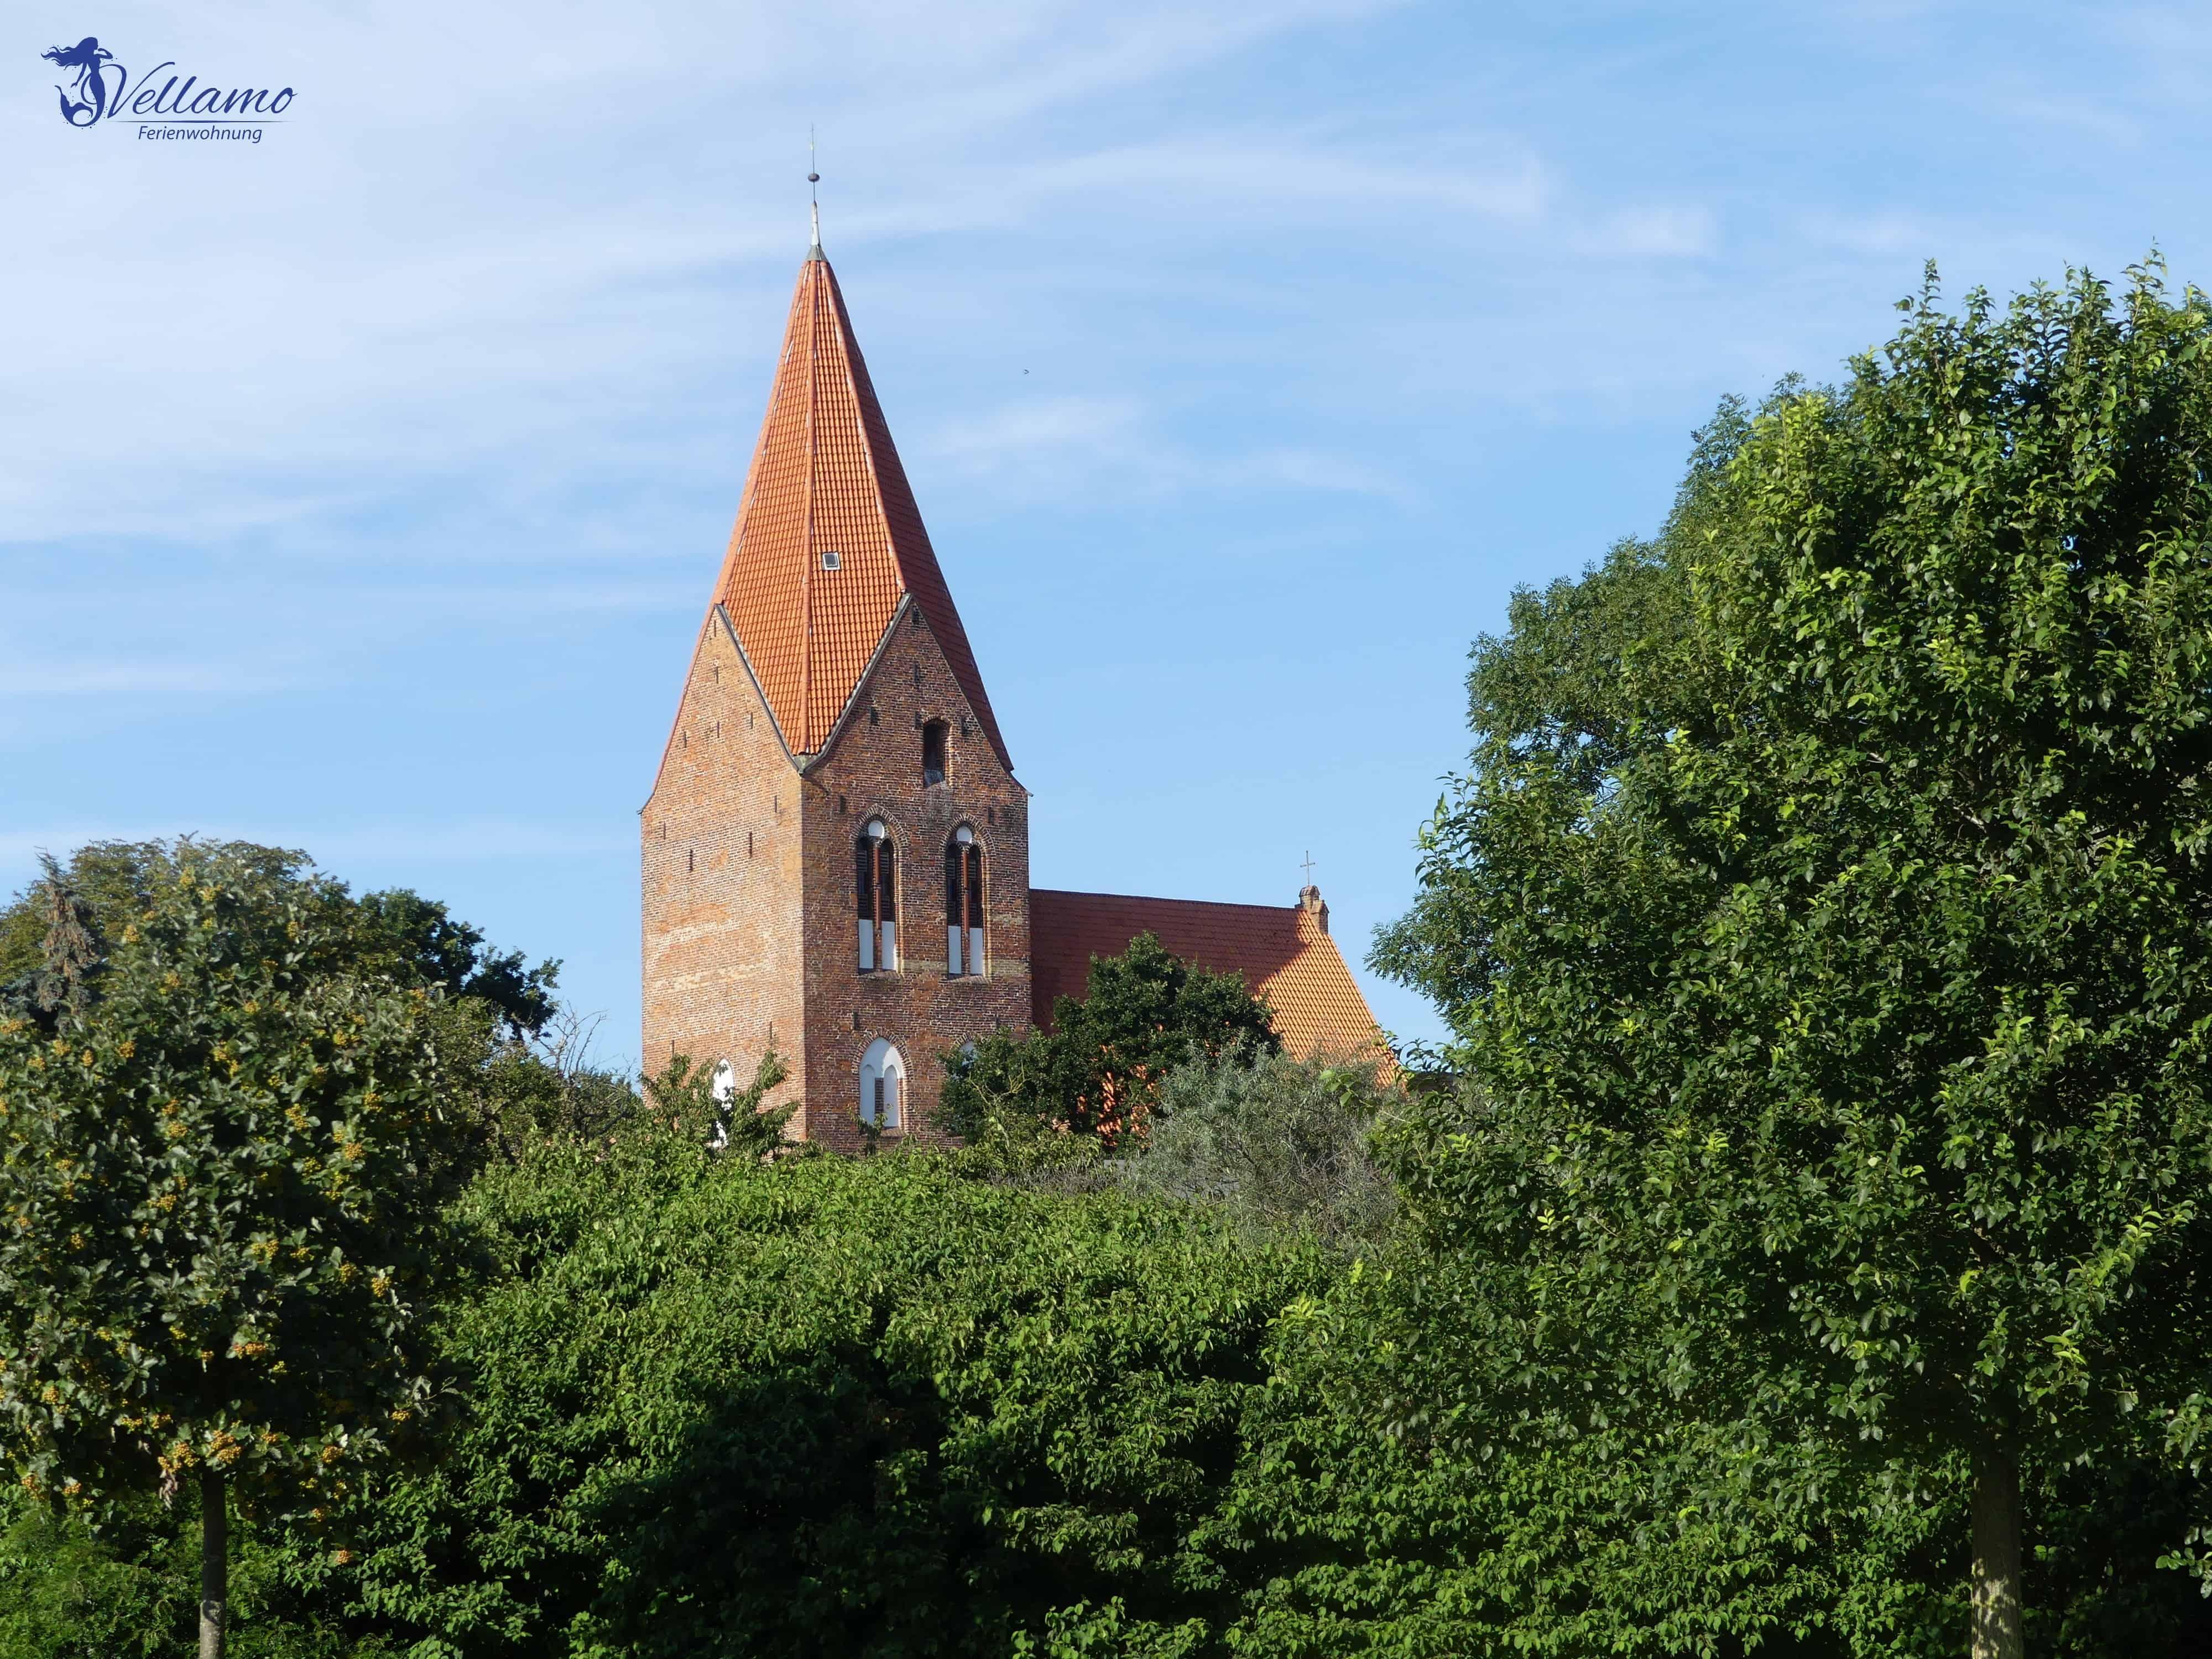 Impressionen Ostseebad Rerik - St-Johannes-Kirche in Rerik